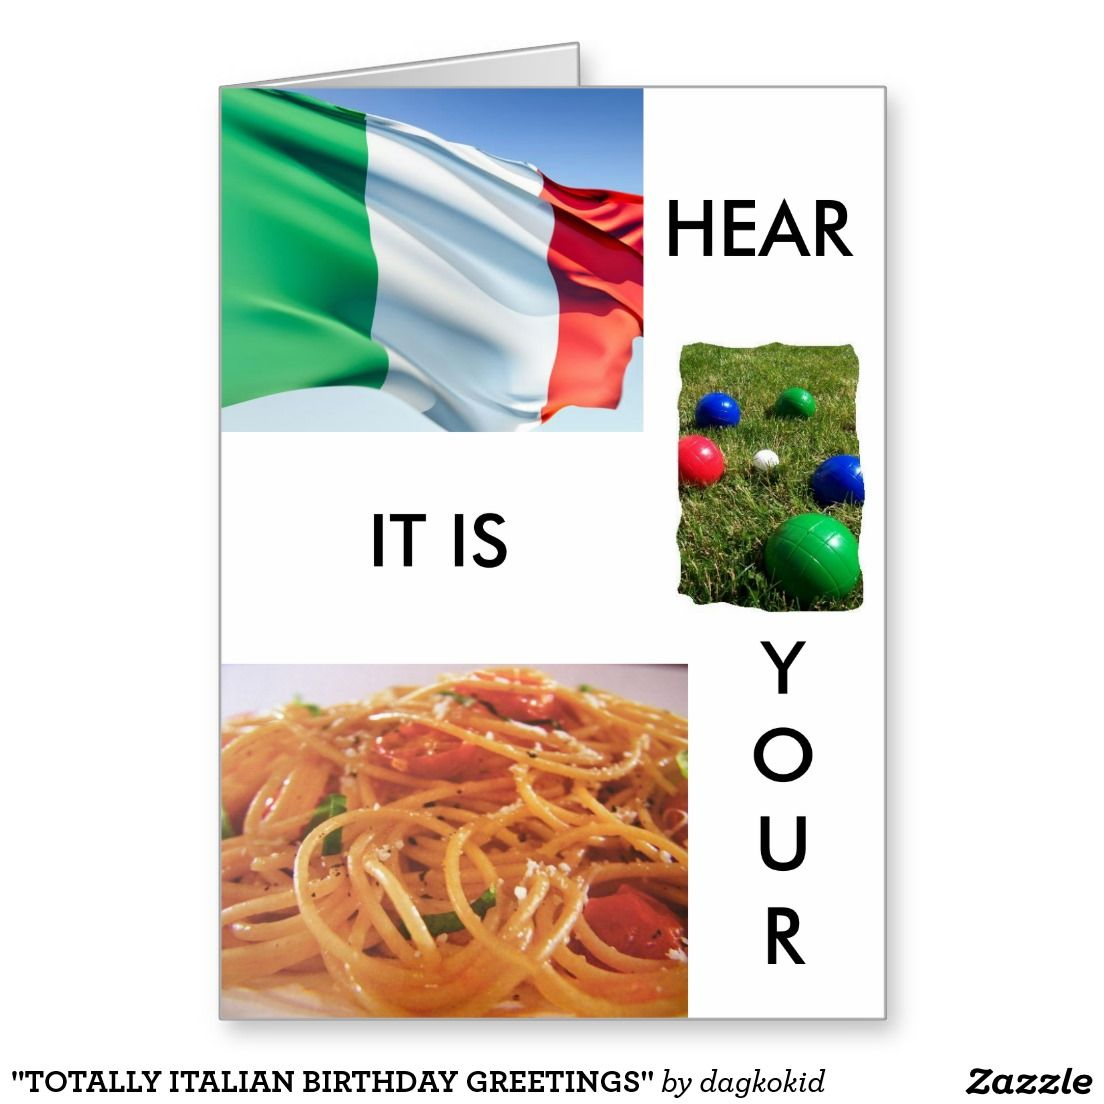 TOTALLY ITALIAN BIRTHDAY GREETINGS GREETING CARD – Italian Birthday Card